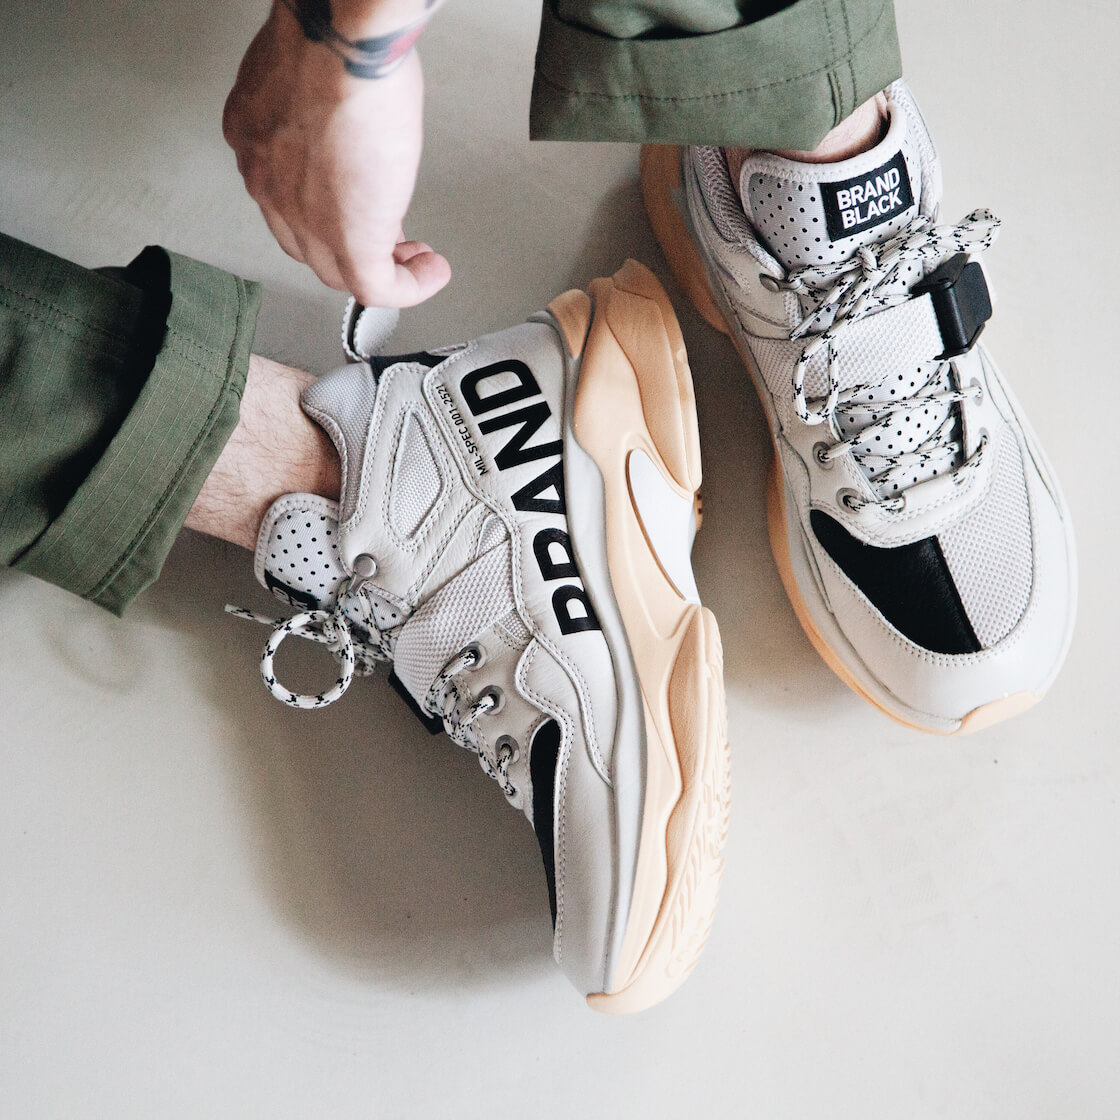 brandblack saga milspec shoes on body